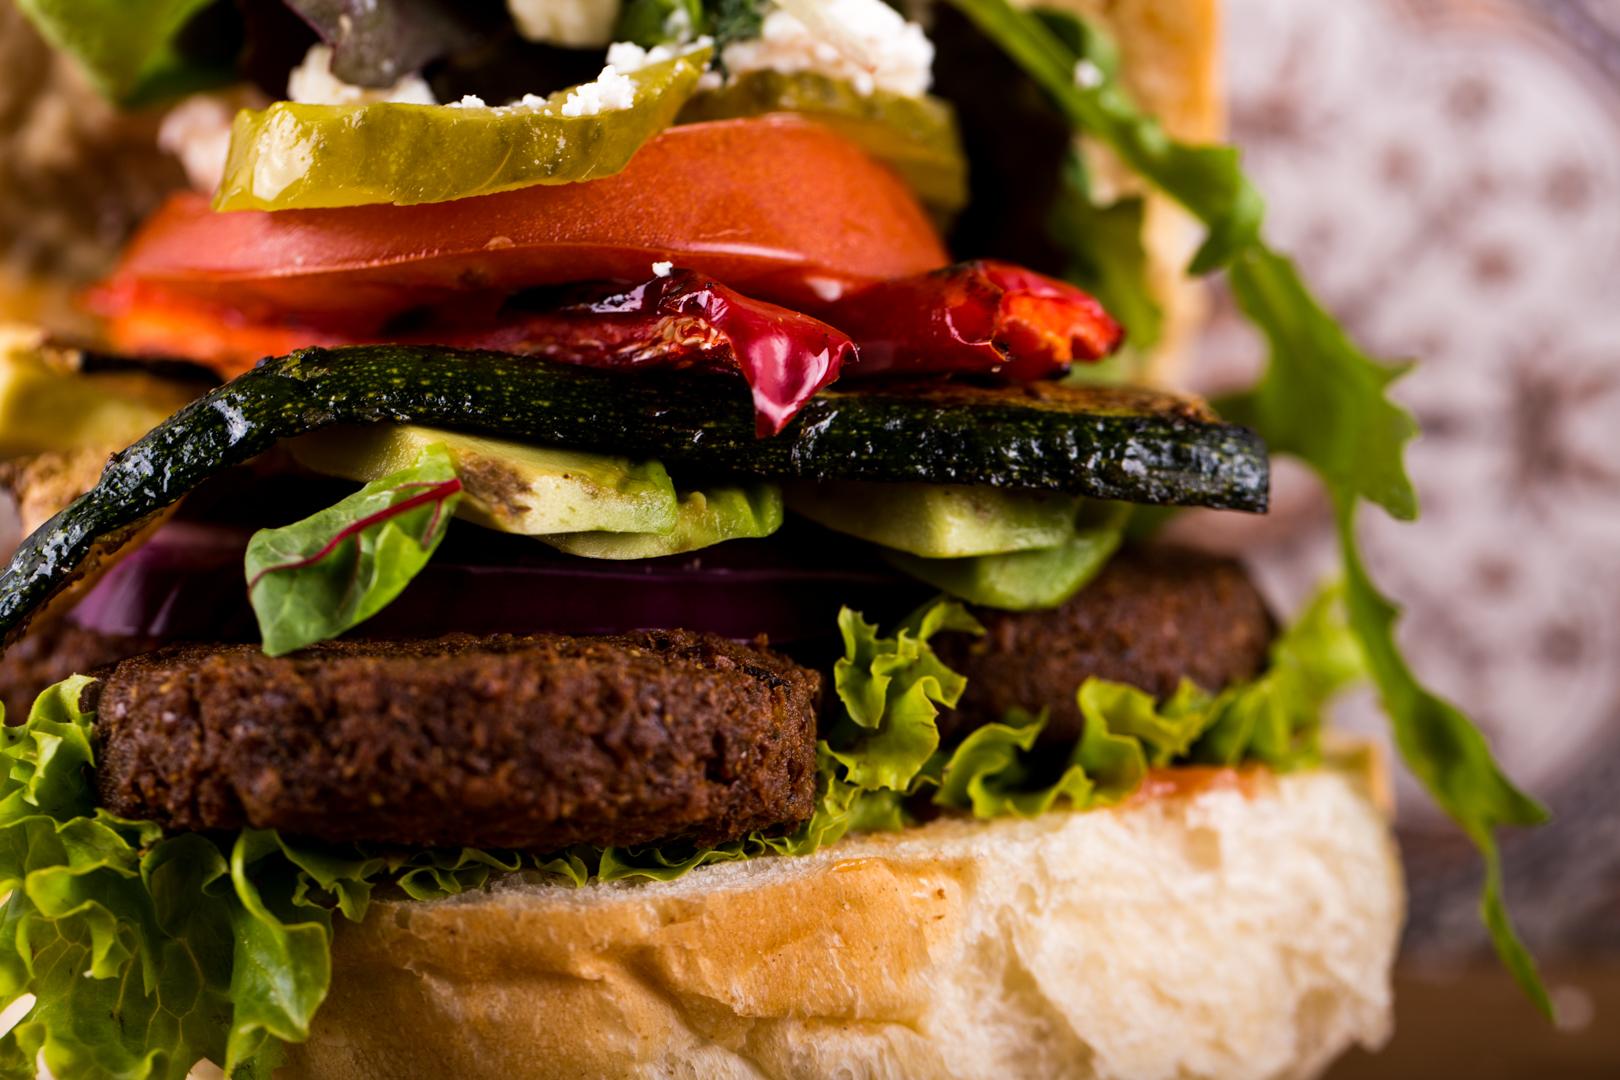 foodtruck, ingolstadt, burger, soulkitchen, essen, pommes, biologisch, burgertruck